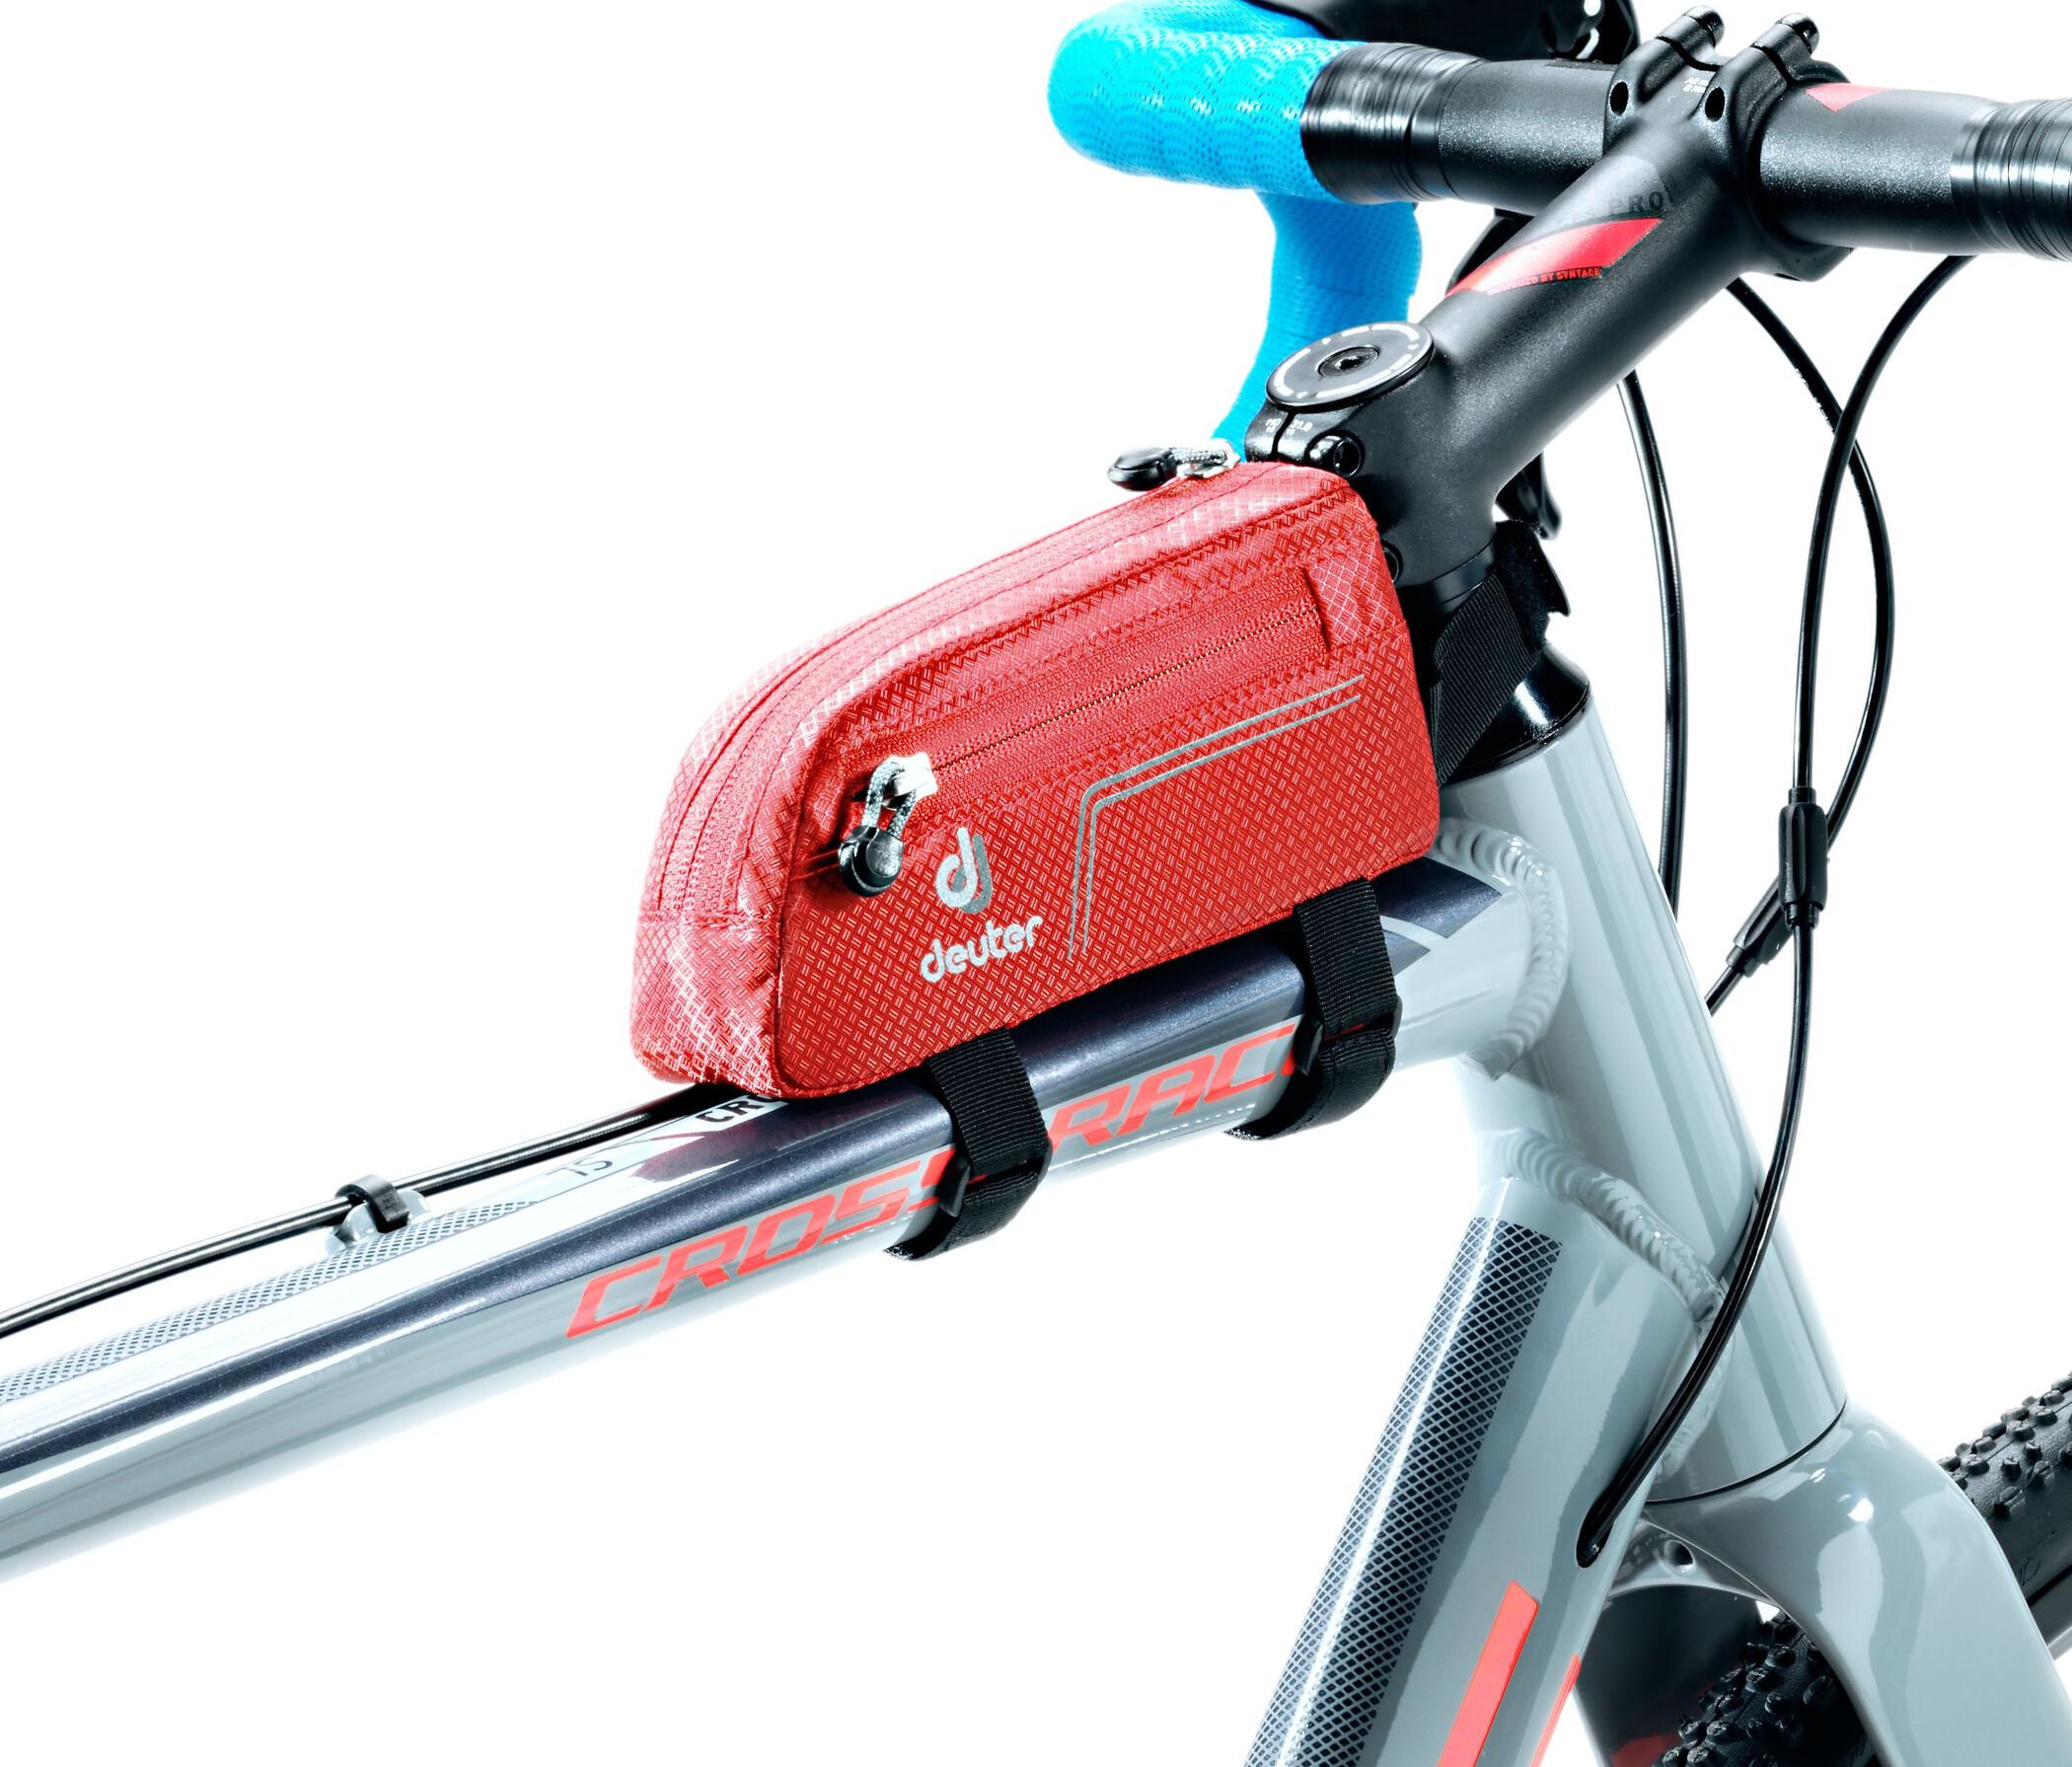 Zefal bicicleta para botella de agua portabidones soporte pulse b2 gris